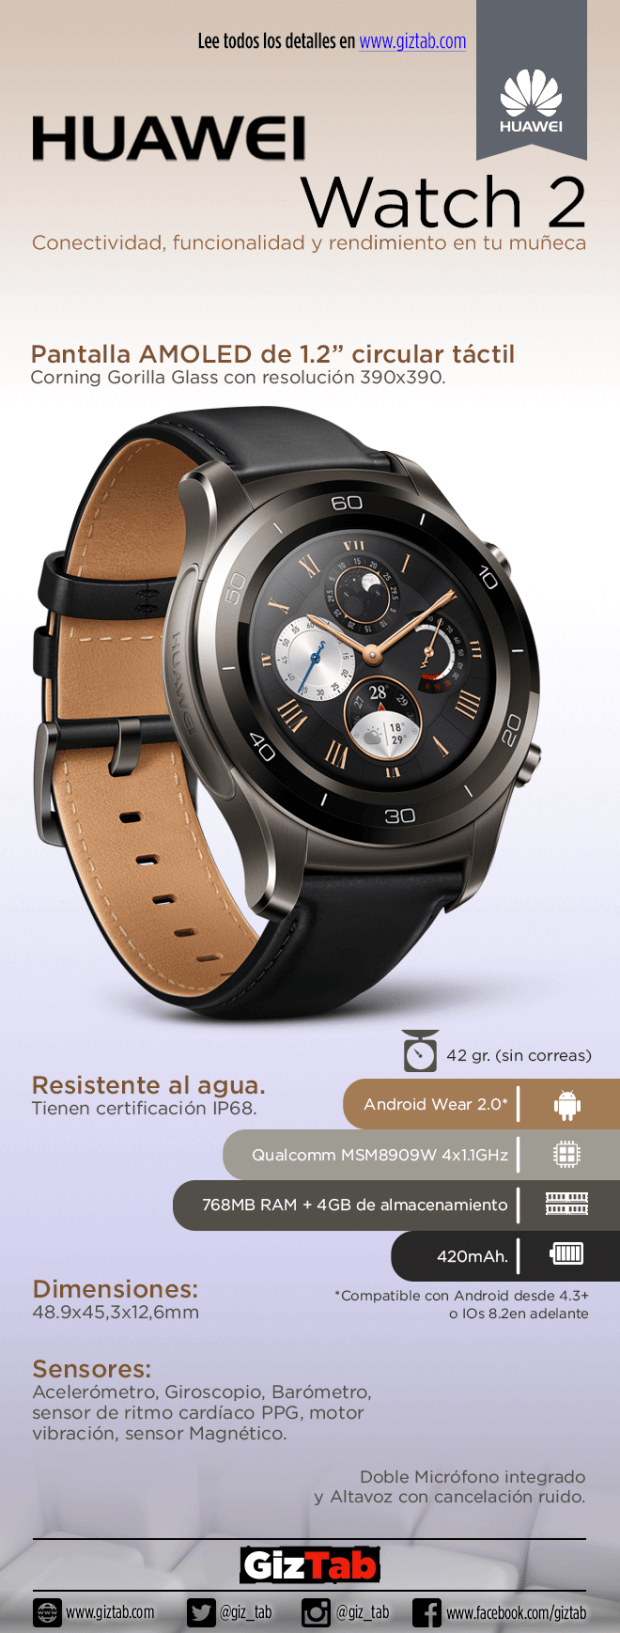 Infografía Huawei Watch 2